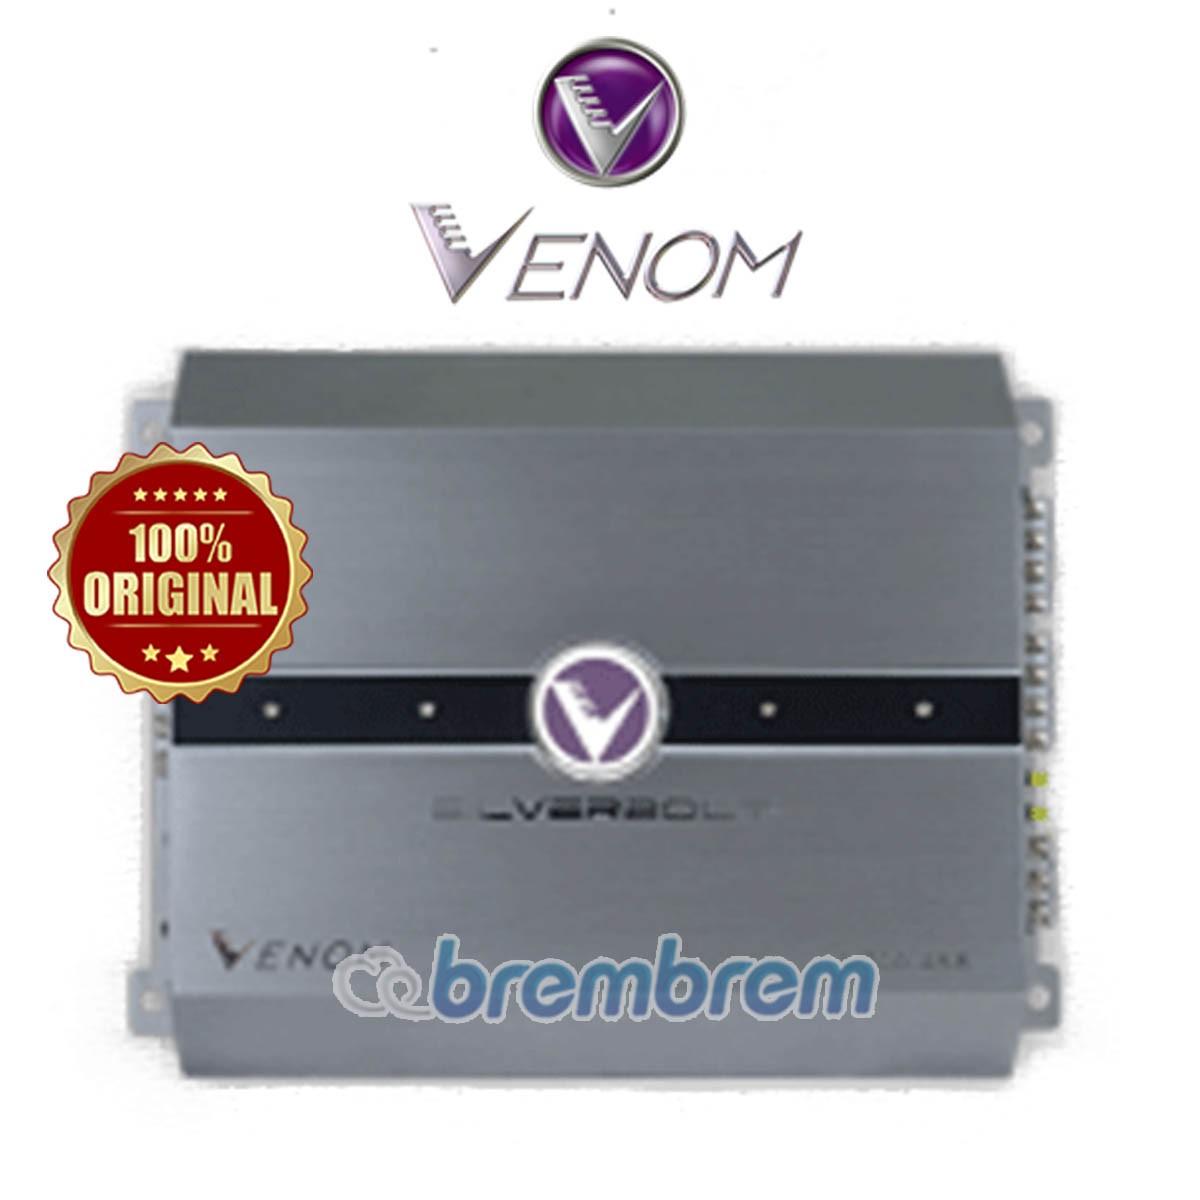 VENOM SILVER SERIES V710.4SB - POWER 4 CHANNEL